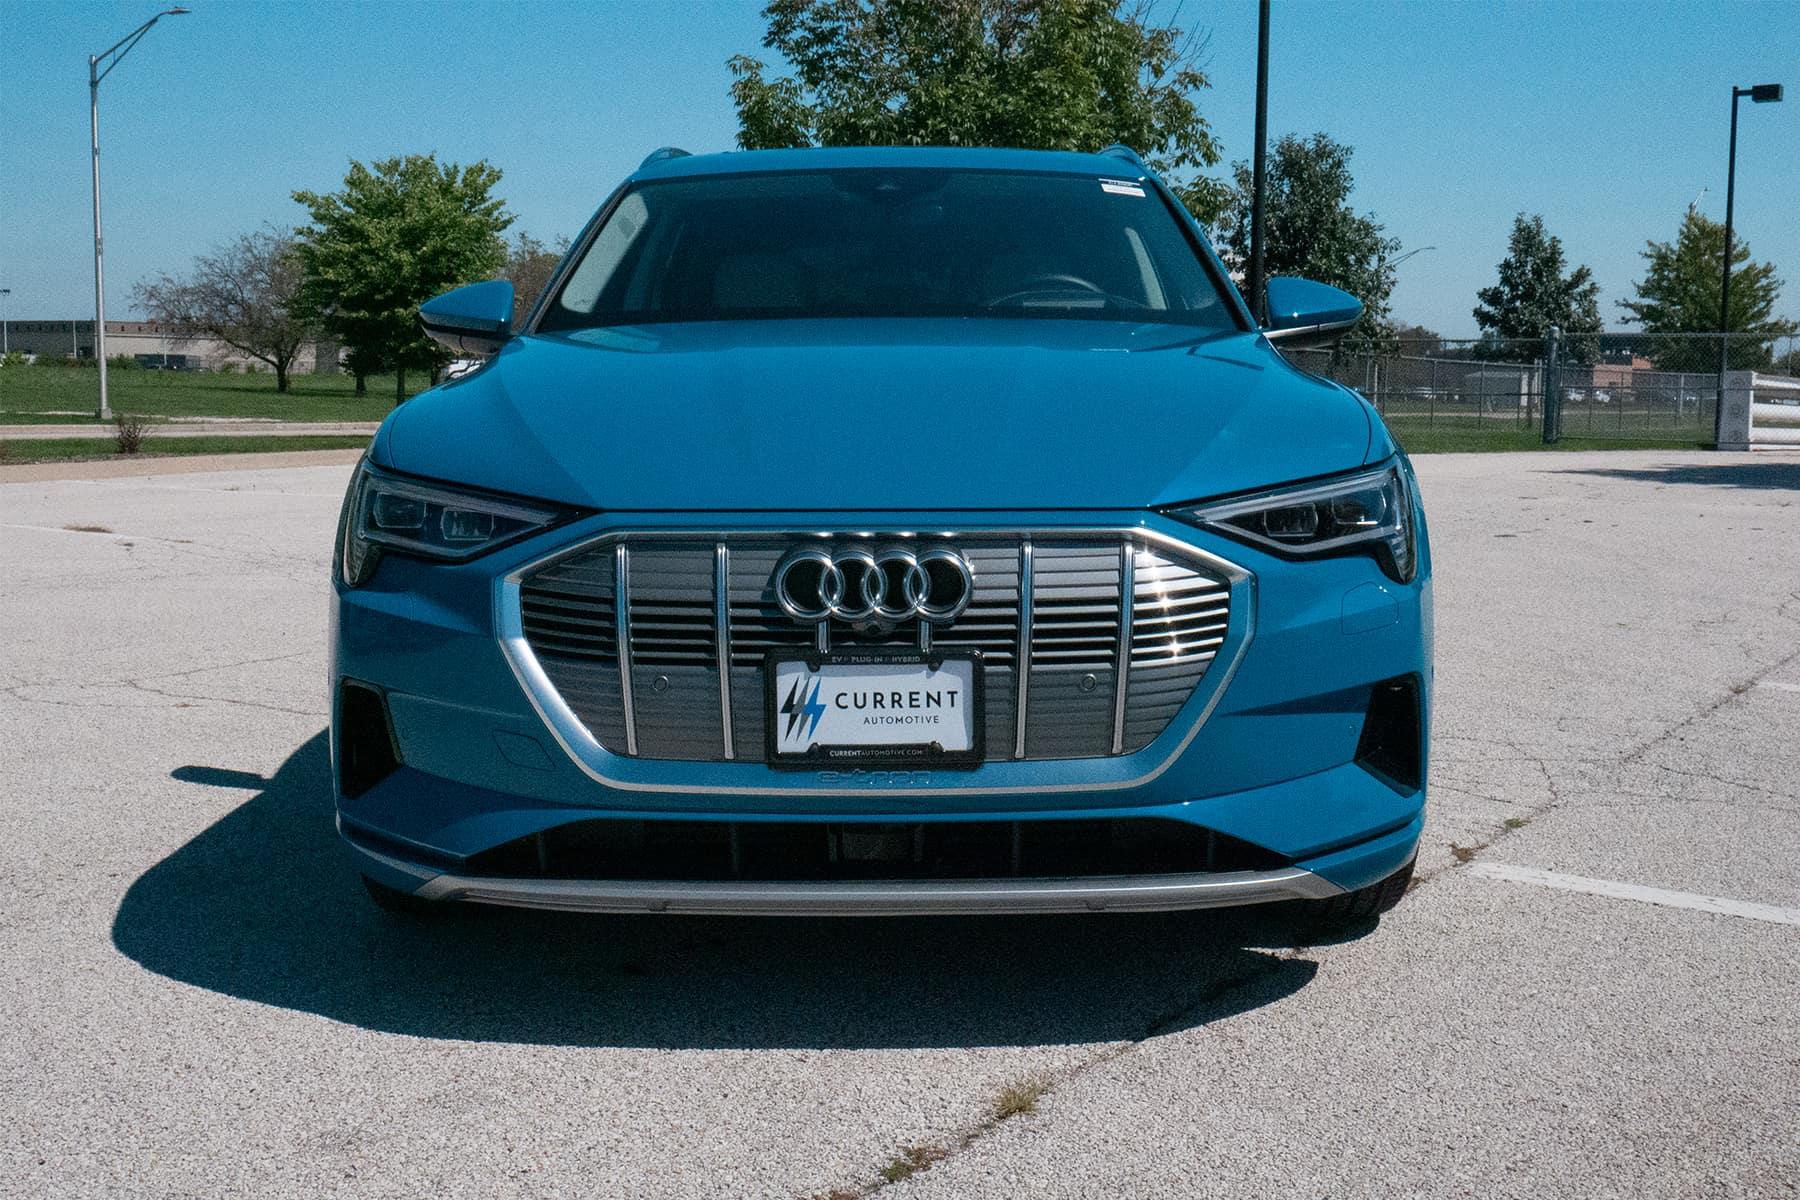 Audi e-tron Grille